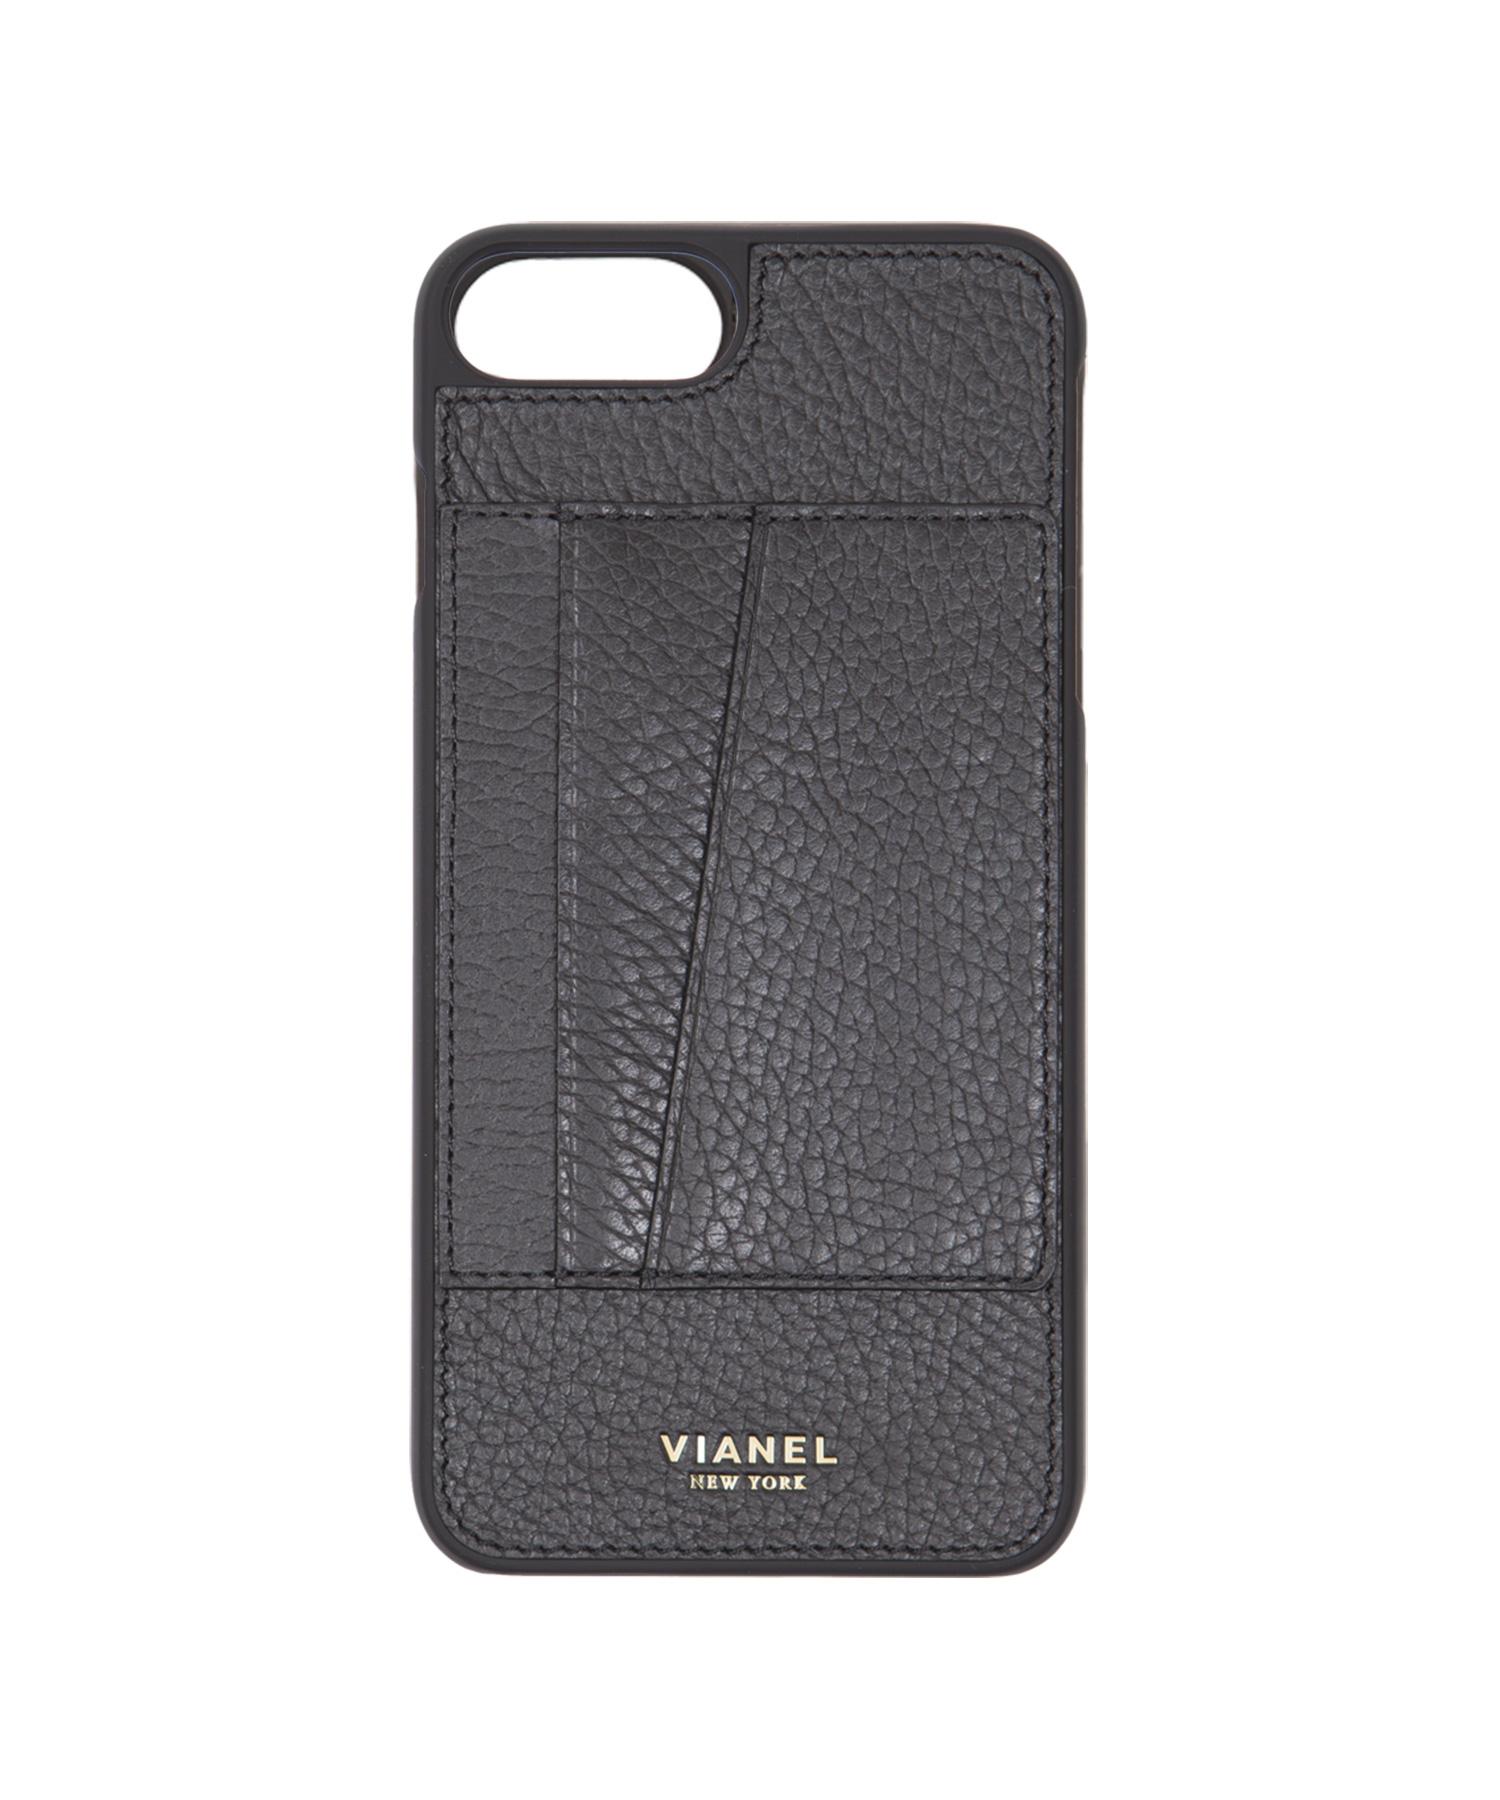 VIANEL NEW YORK Card Holder iPhone 7/8 Cases